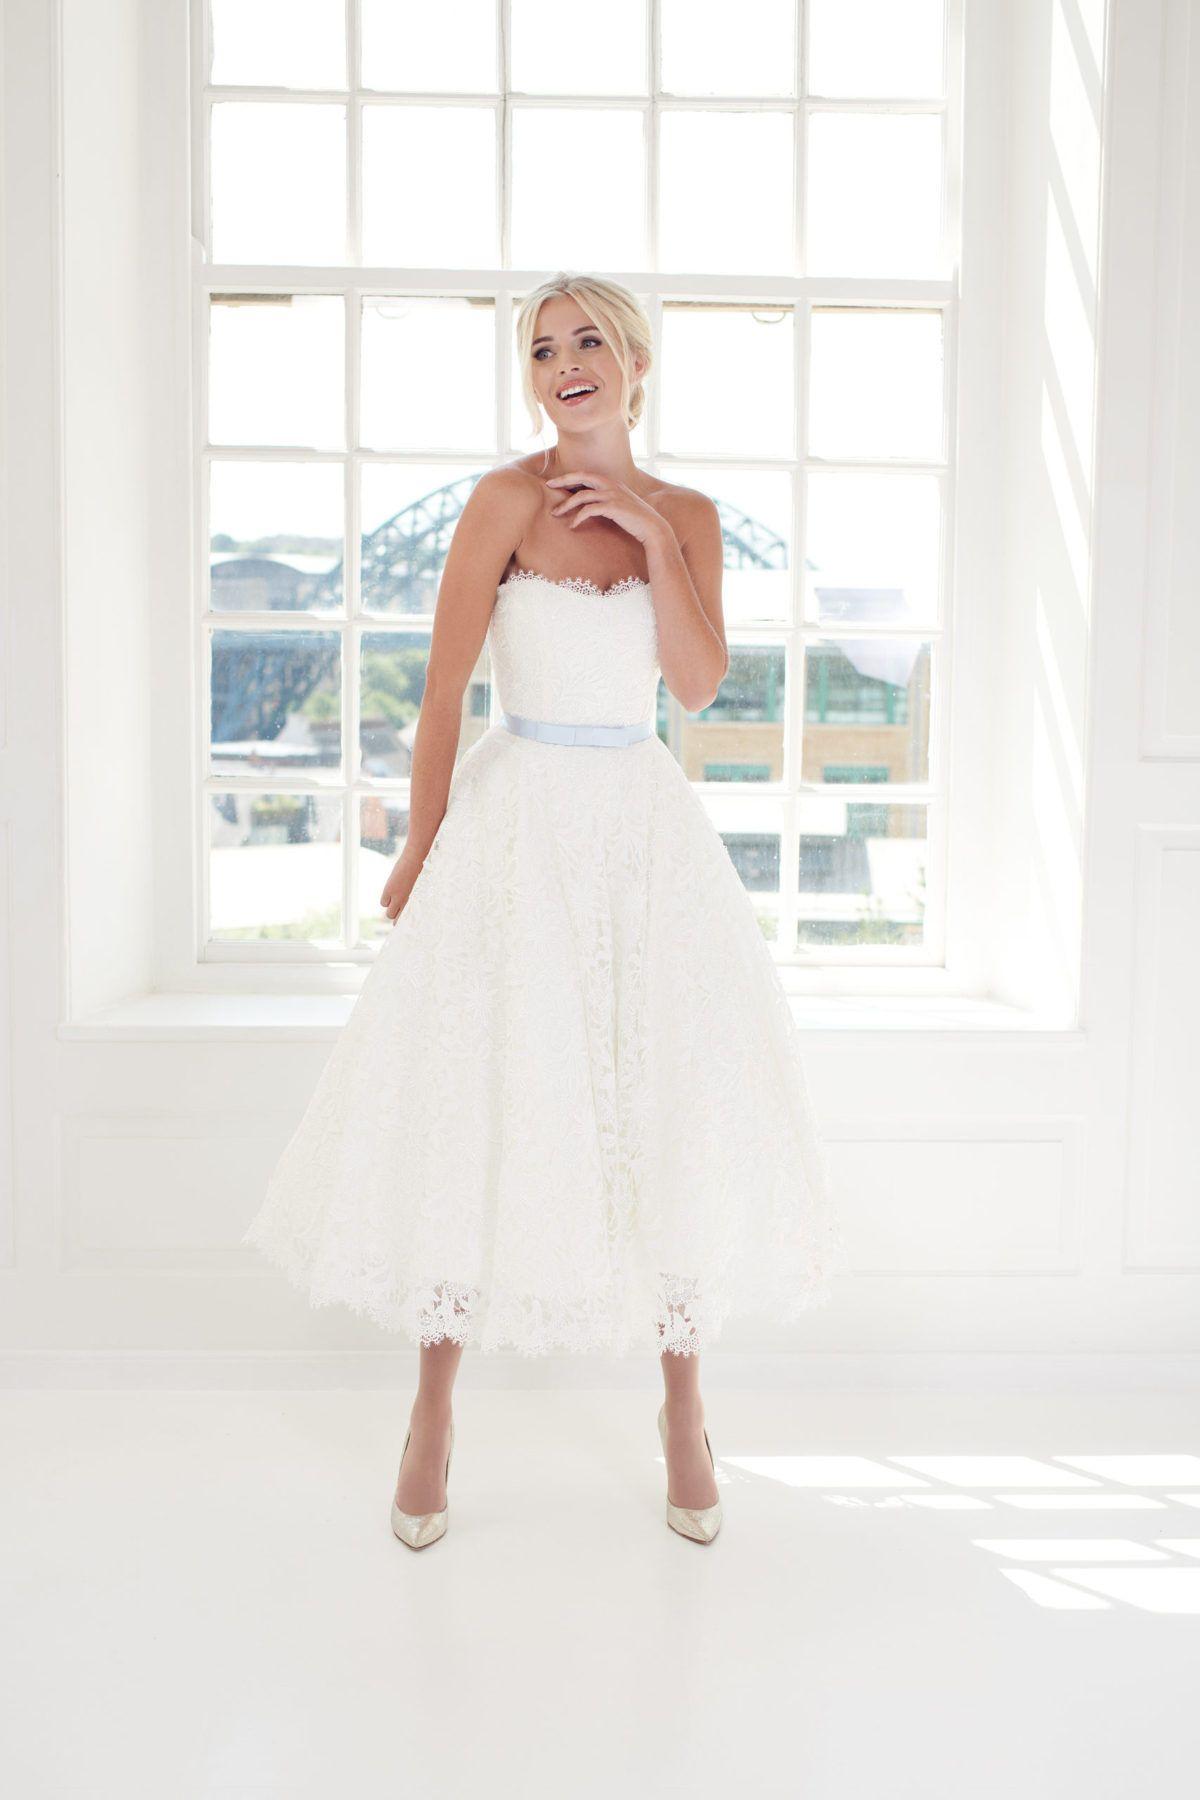 Beautifully Elegant Strapless Lace Ballerina Length Wedding Dress Eye Lash Lace Trim To The Bustline And Dresses Short Wedding Dress Tea Length Wedding Dress [ 1800 x 1200 Pixel ]